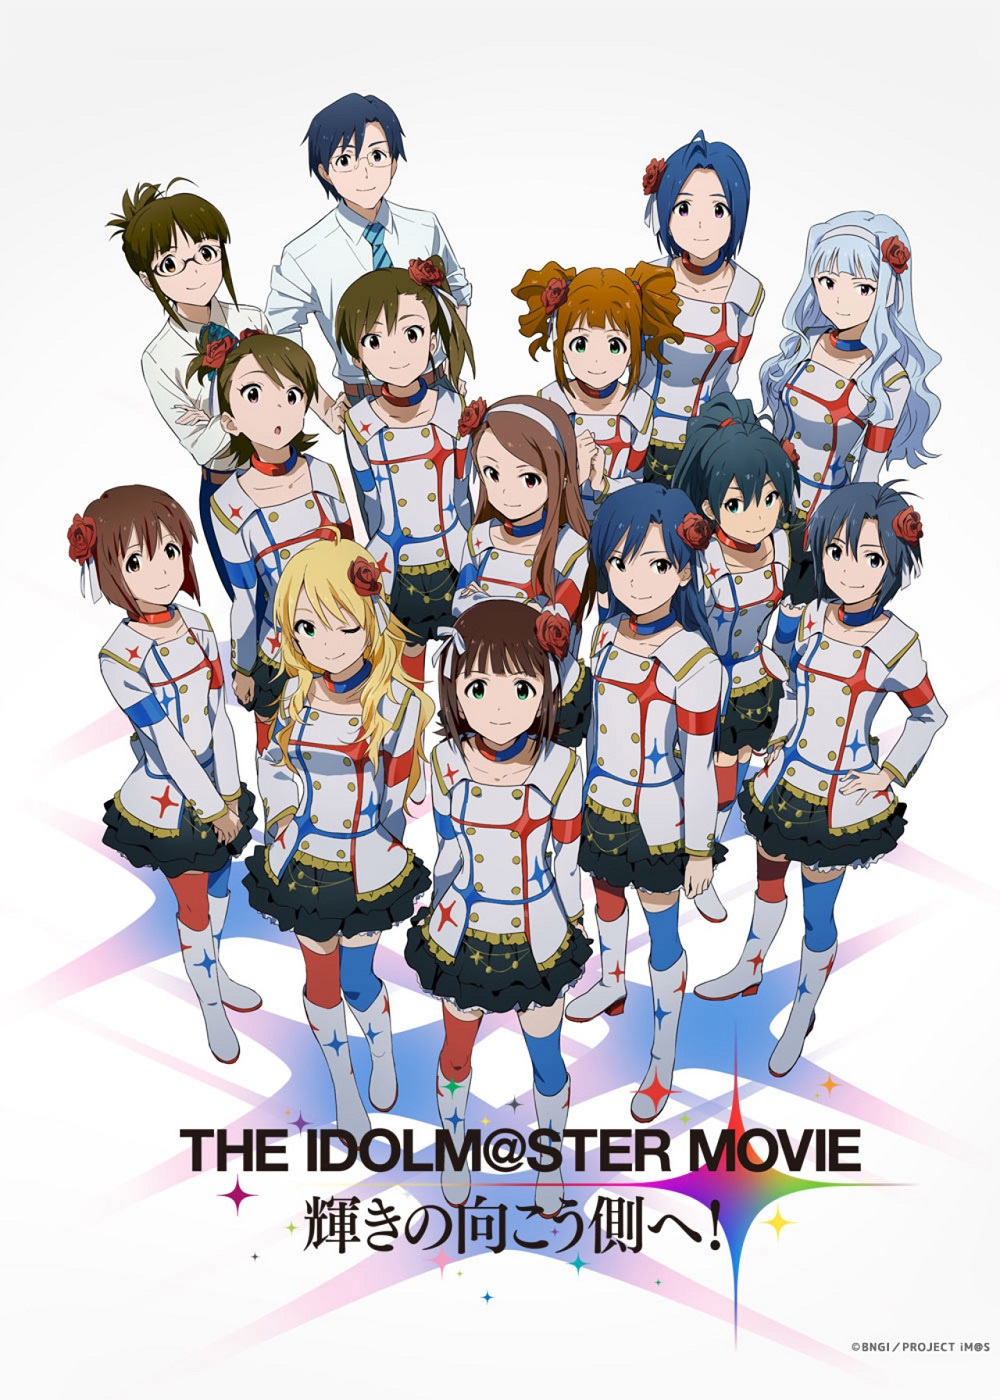 The iDOLM@STER Movie: Kagayaki no mukougawa e kapak